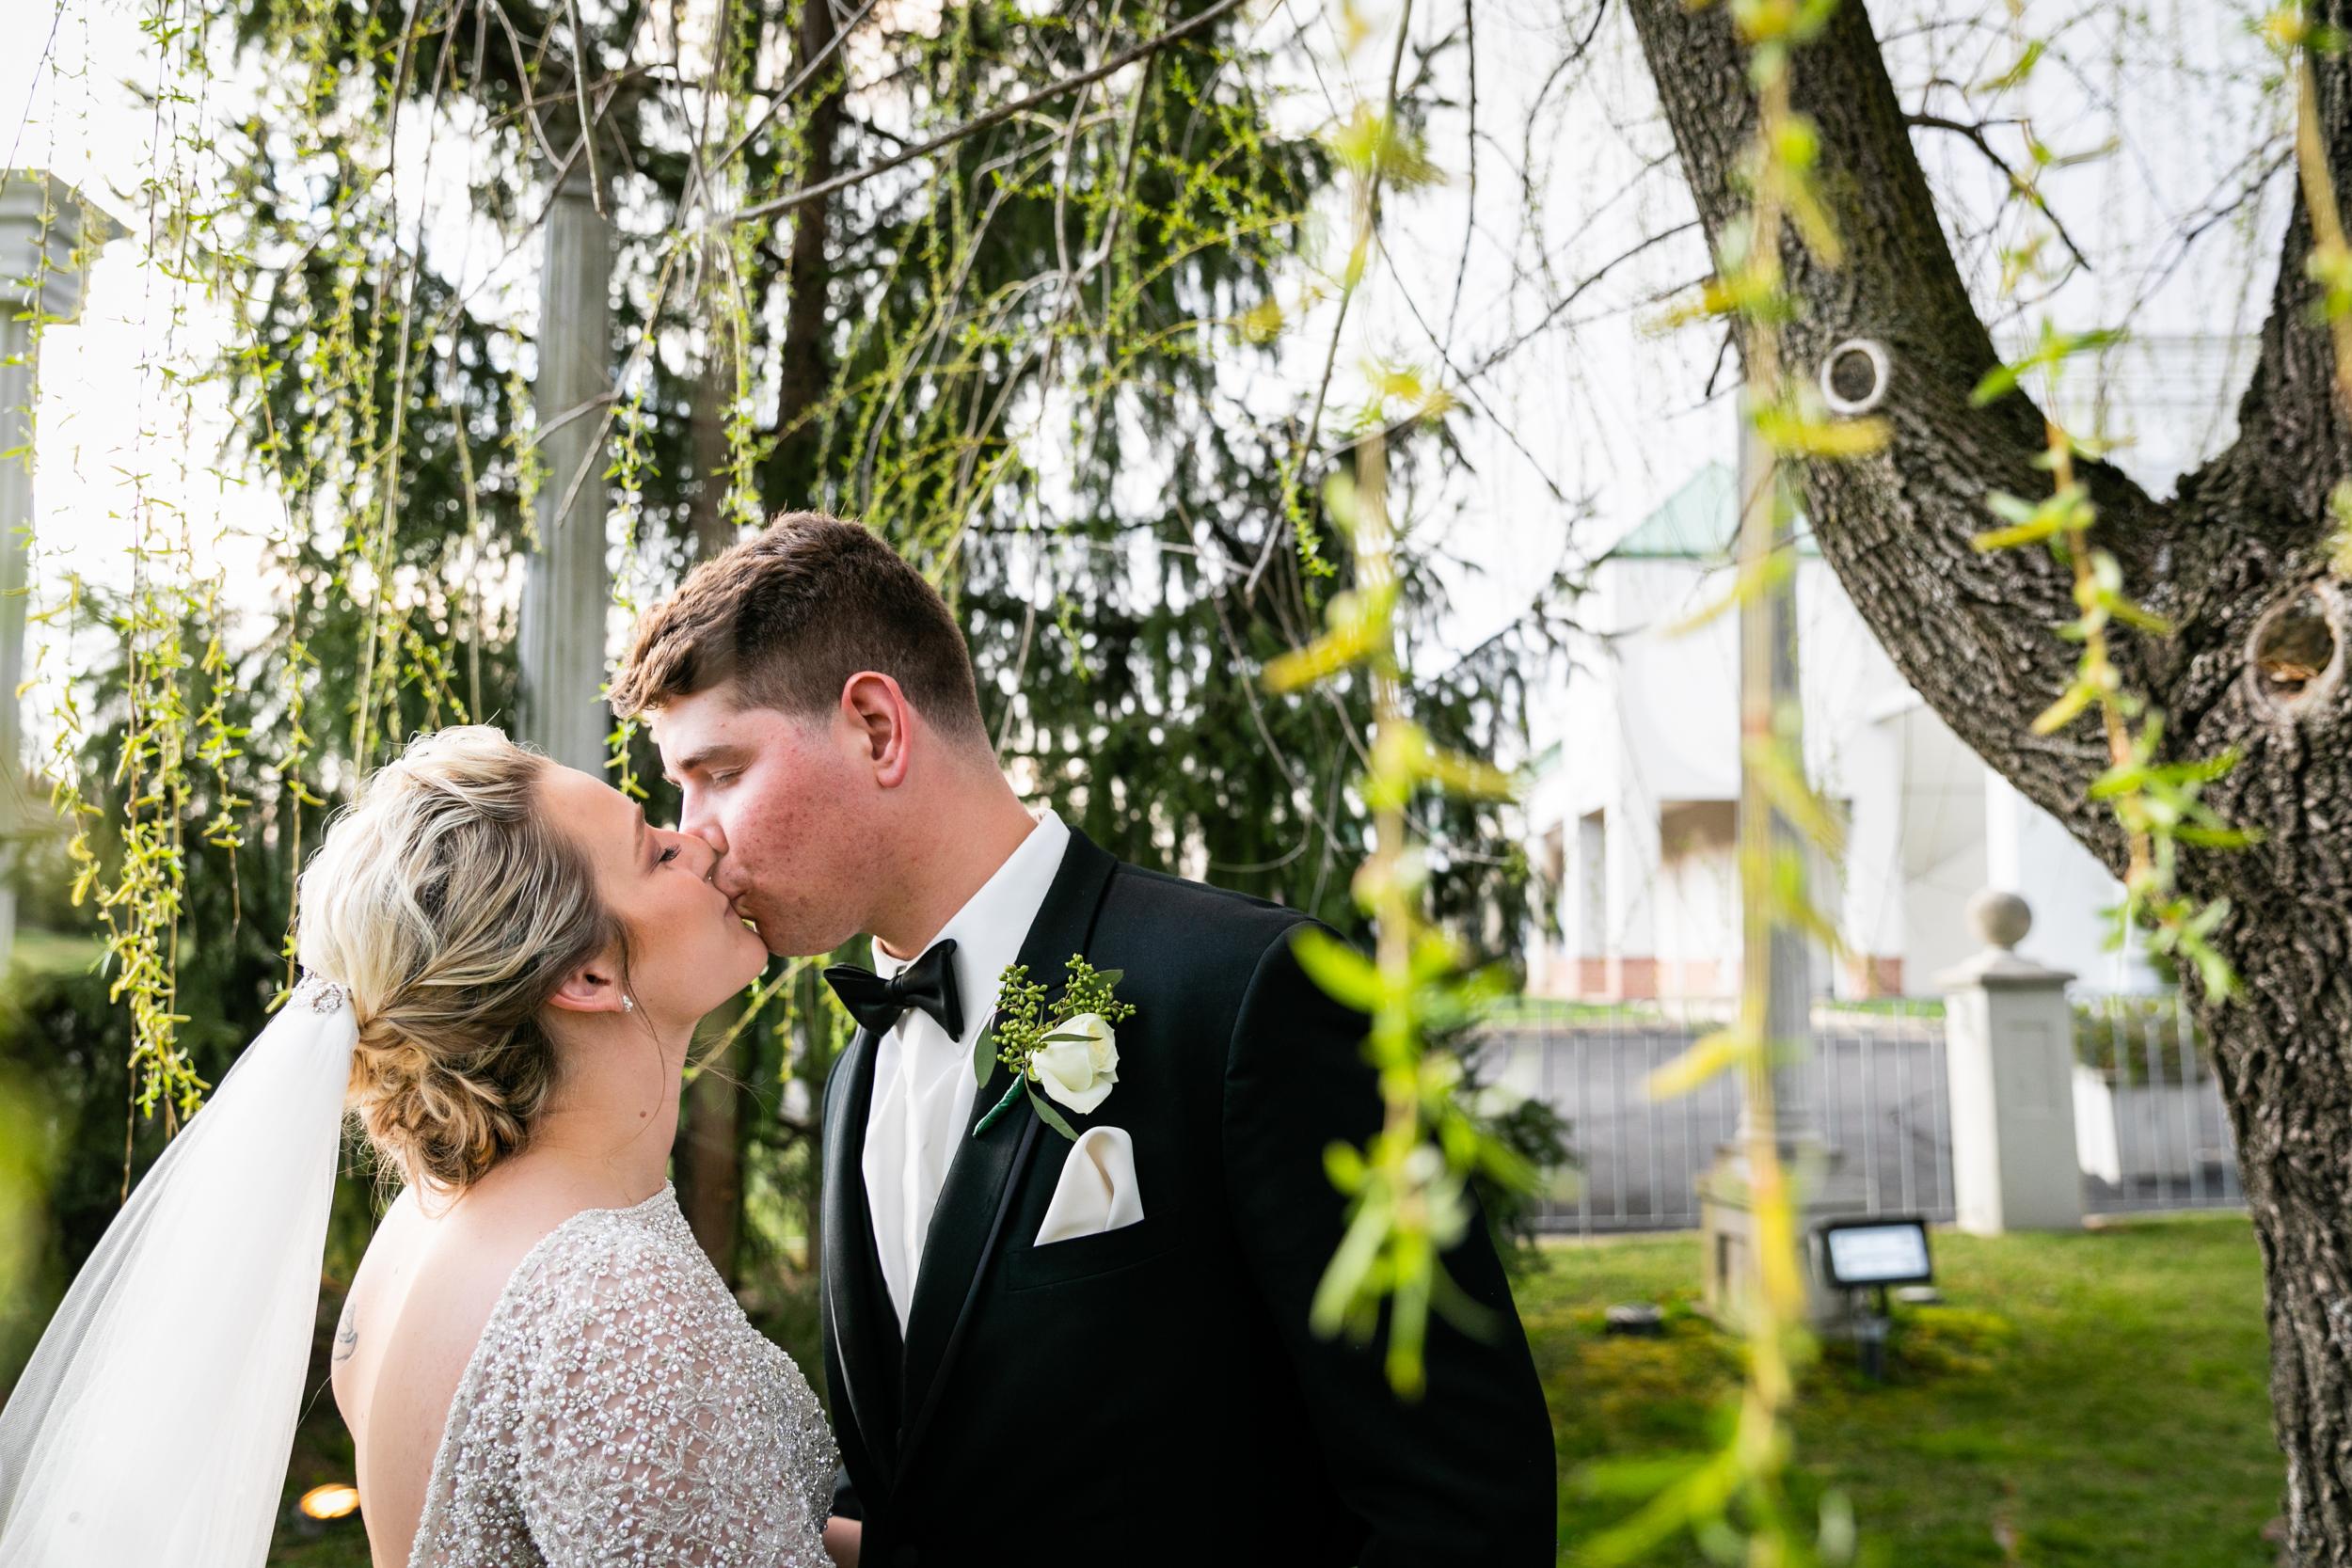 CELEBRATIONS BENSALEM WEDDING PHOTOGRAPHY-69.jpg